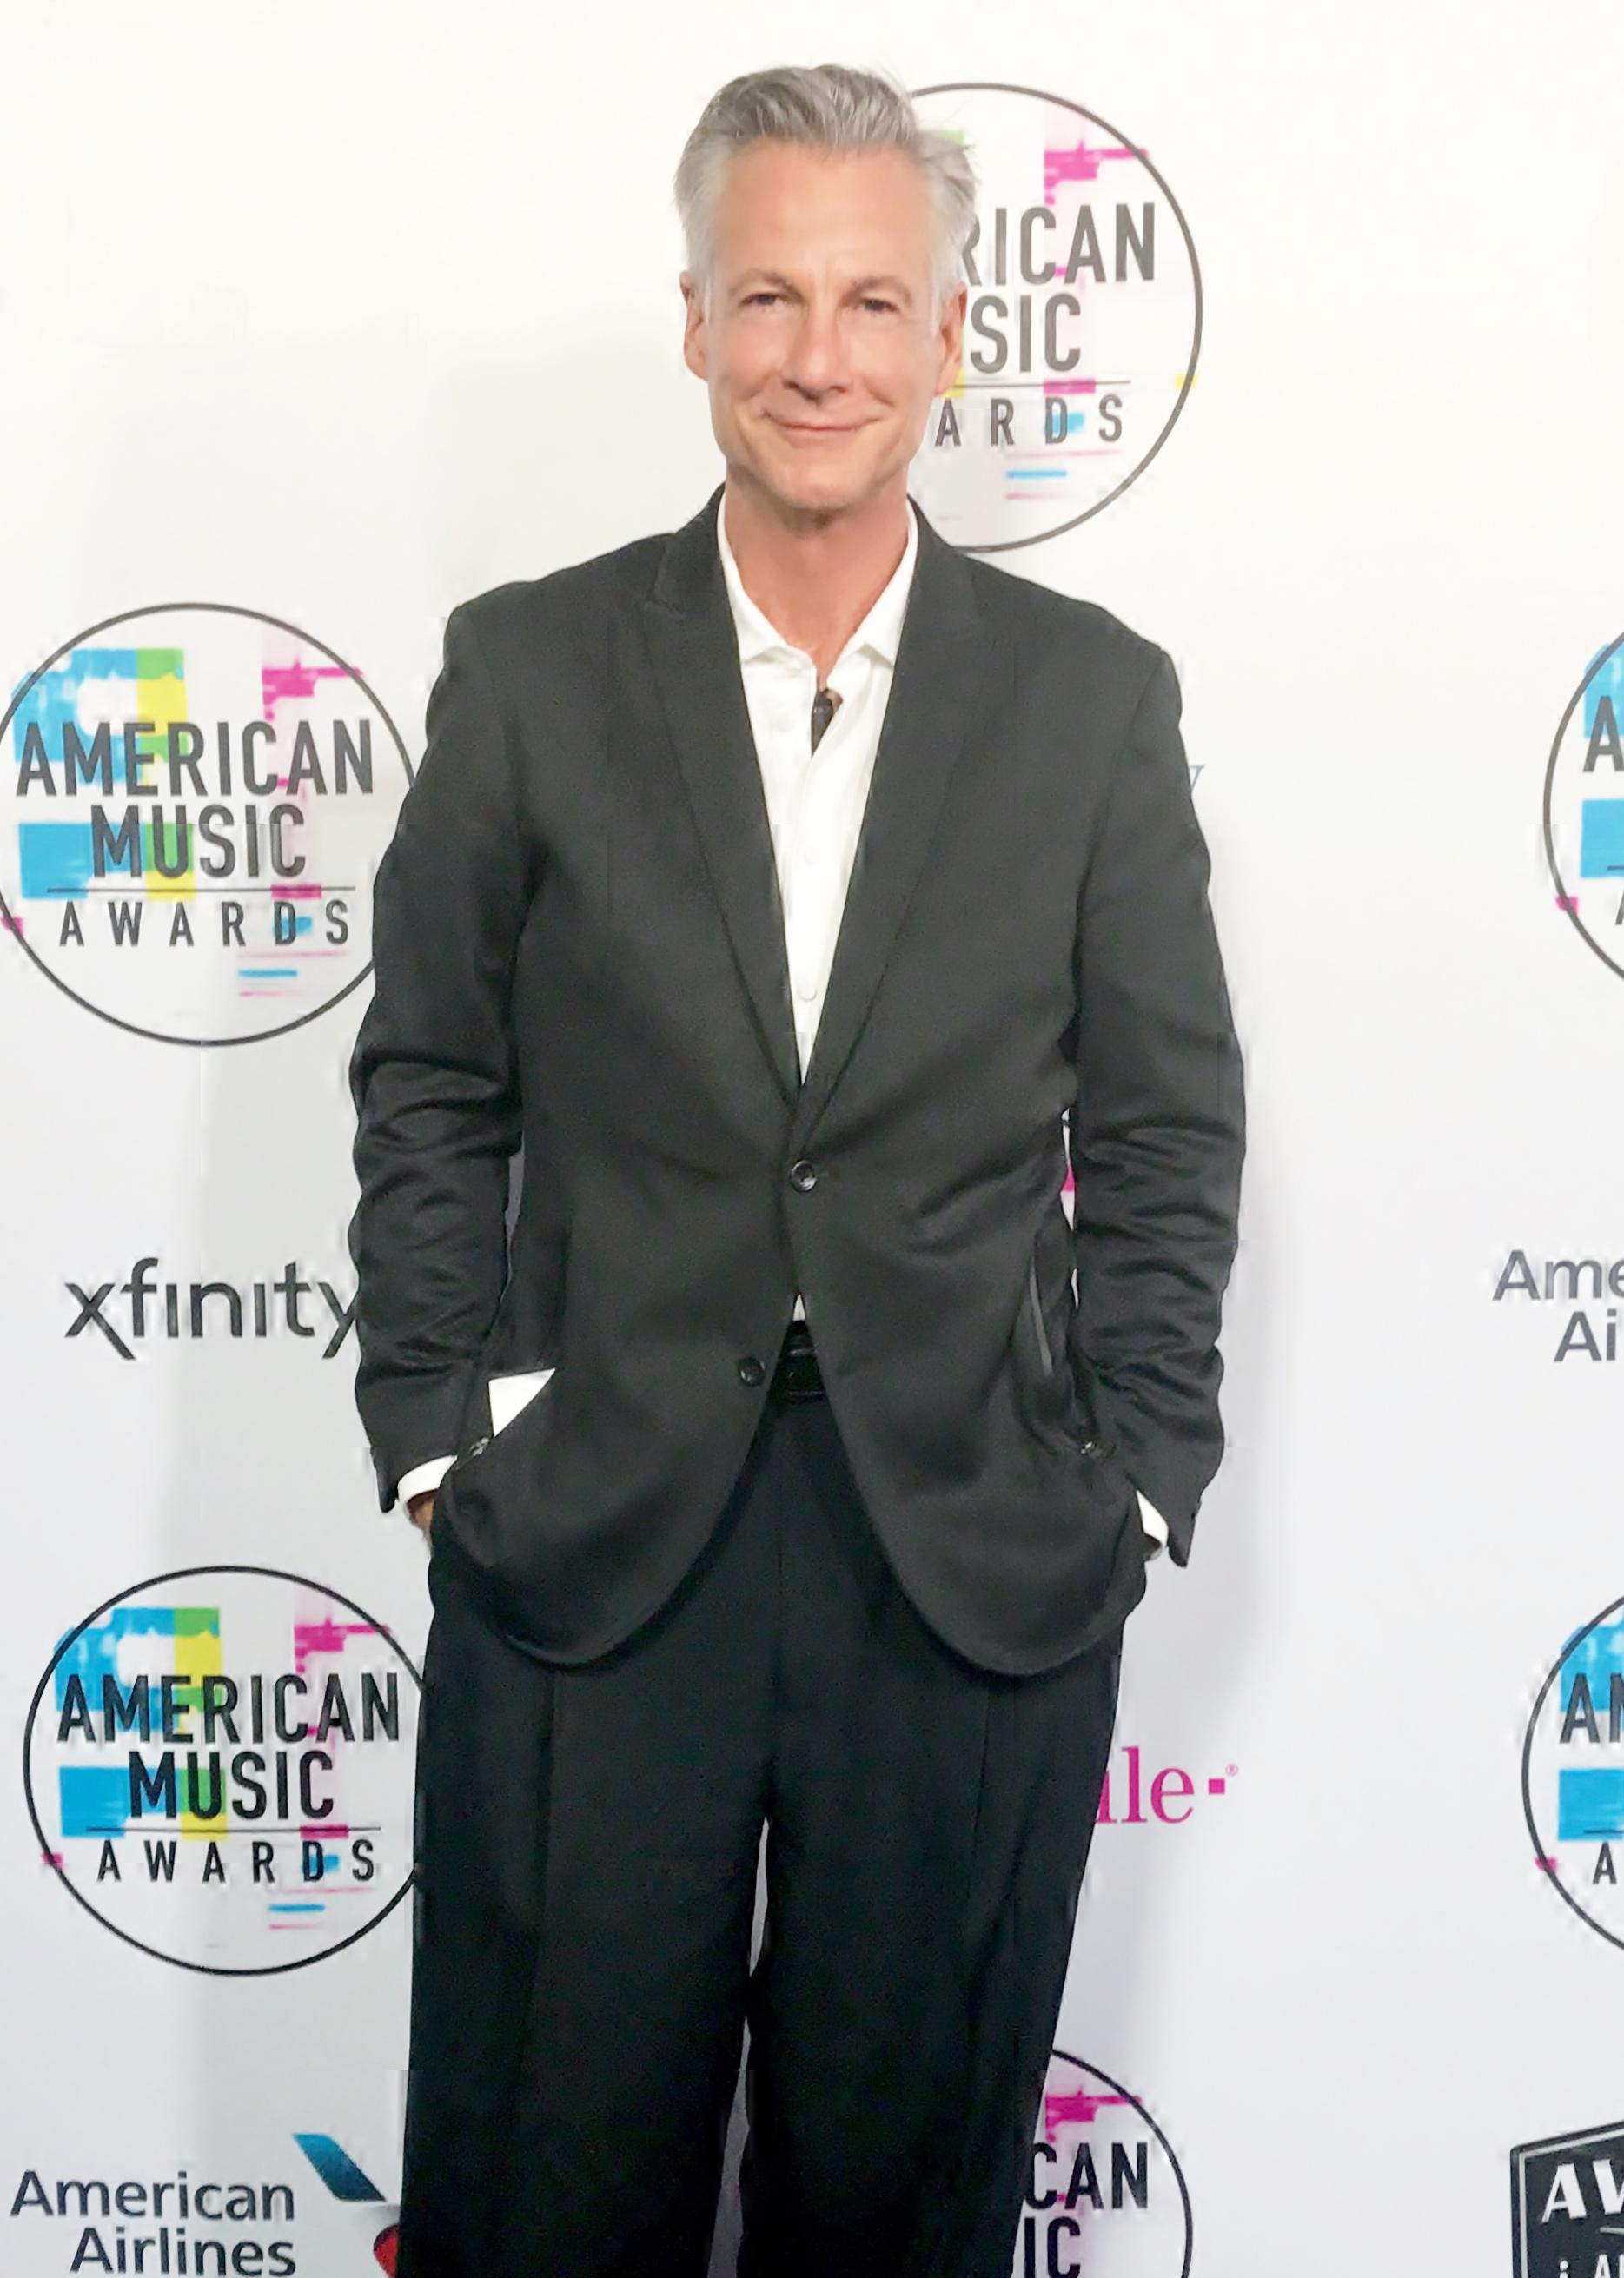 Michael Nicklin at the 2017 American Music Awards, Los Angeles, CA